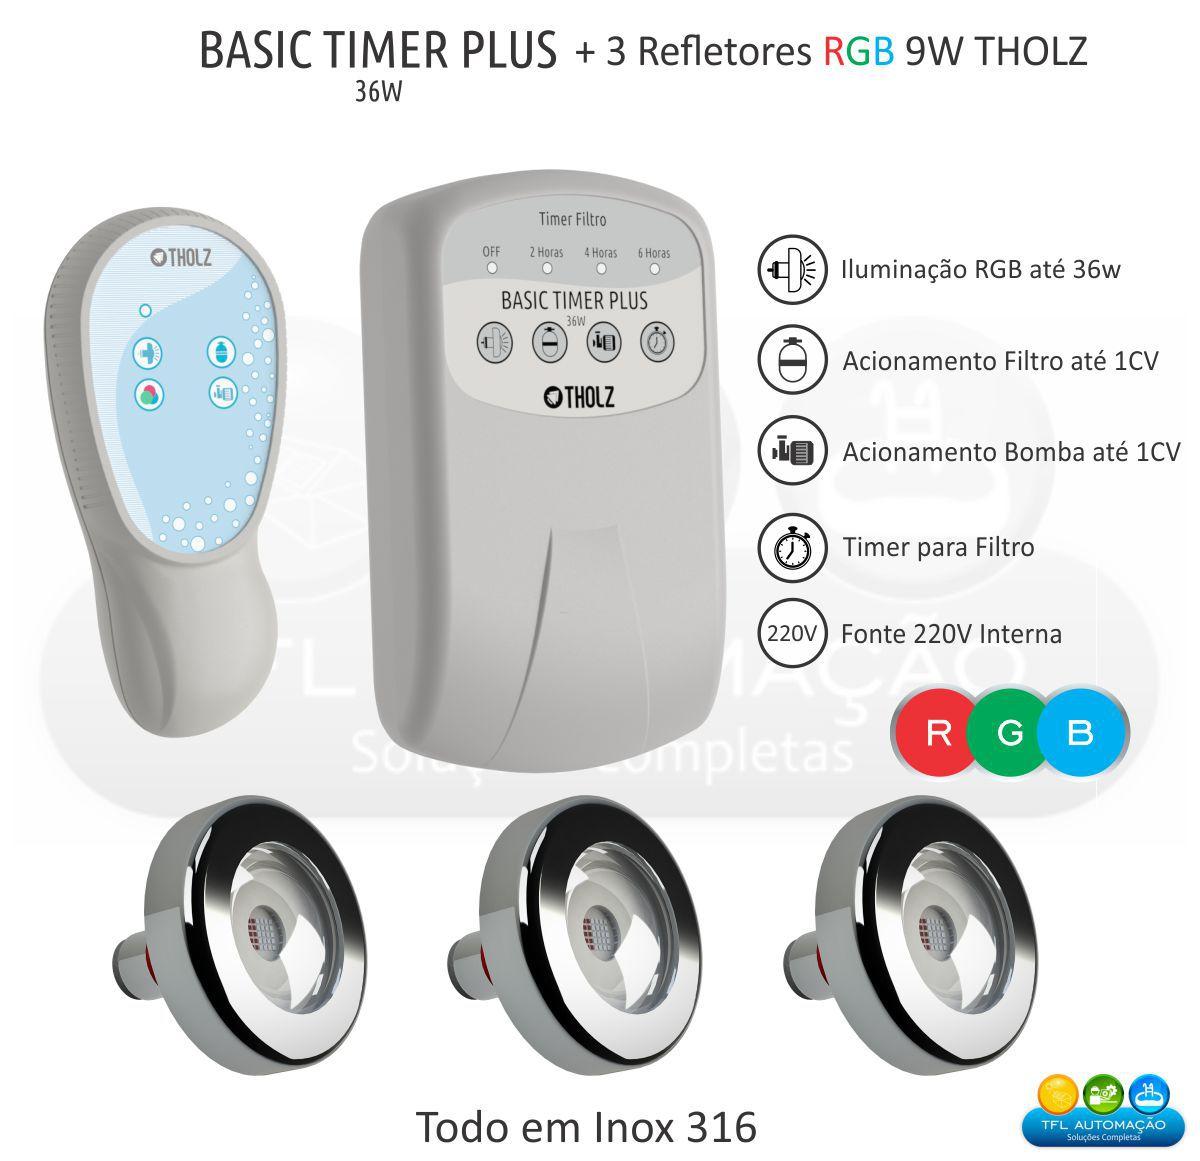 Kit Iluminação Piscina - 3 Leds Rgb 9w Tholz + Basic Timer Plus 36w